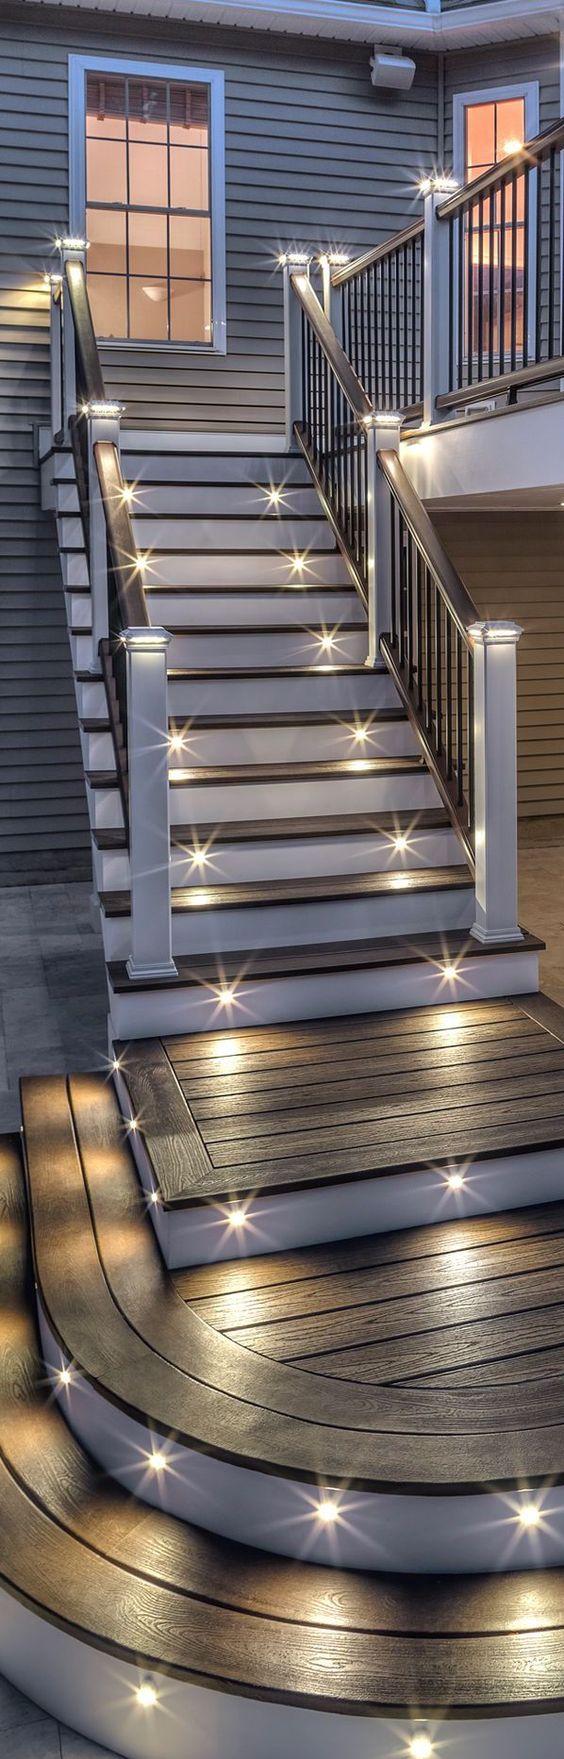 Lighting Basement Washroom Stairs: Stairs, Lighting And Stair Lighting On Pinterest